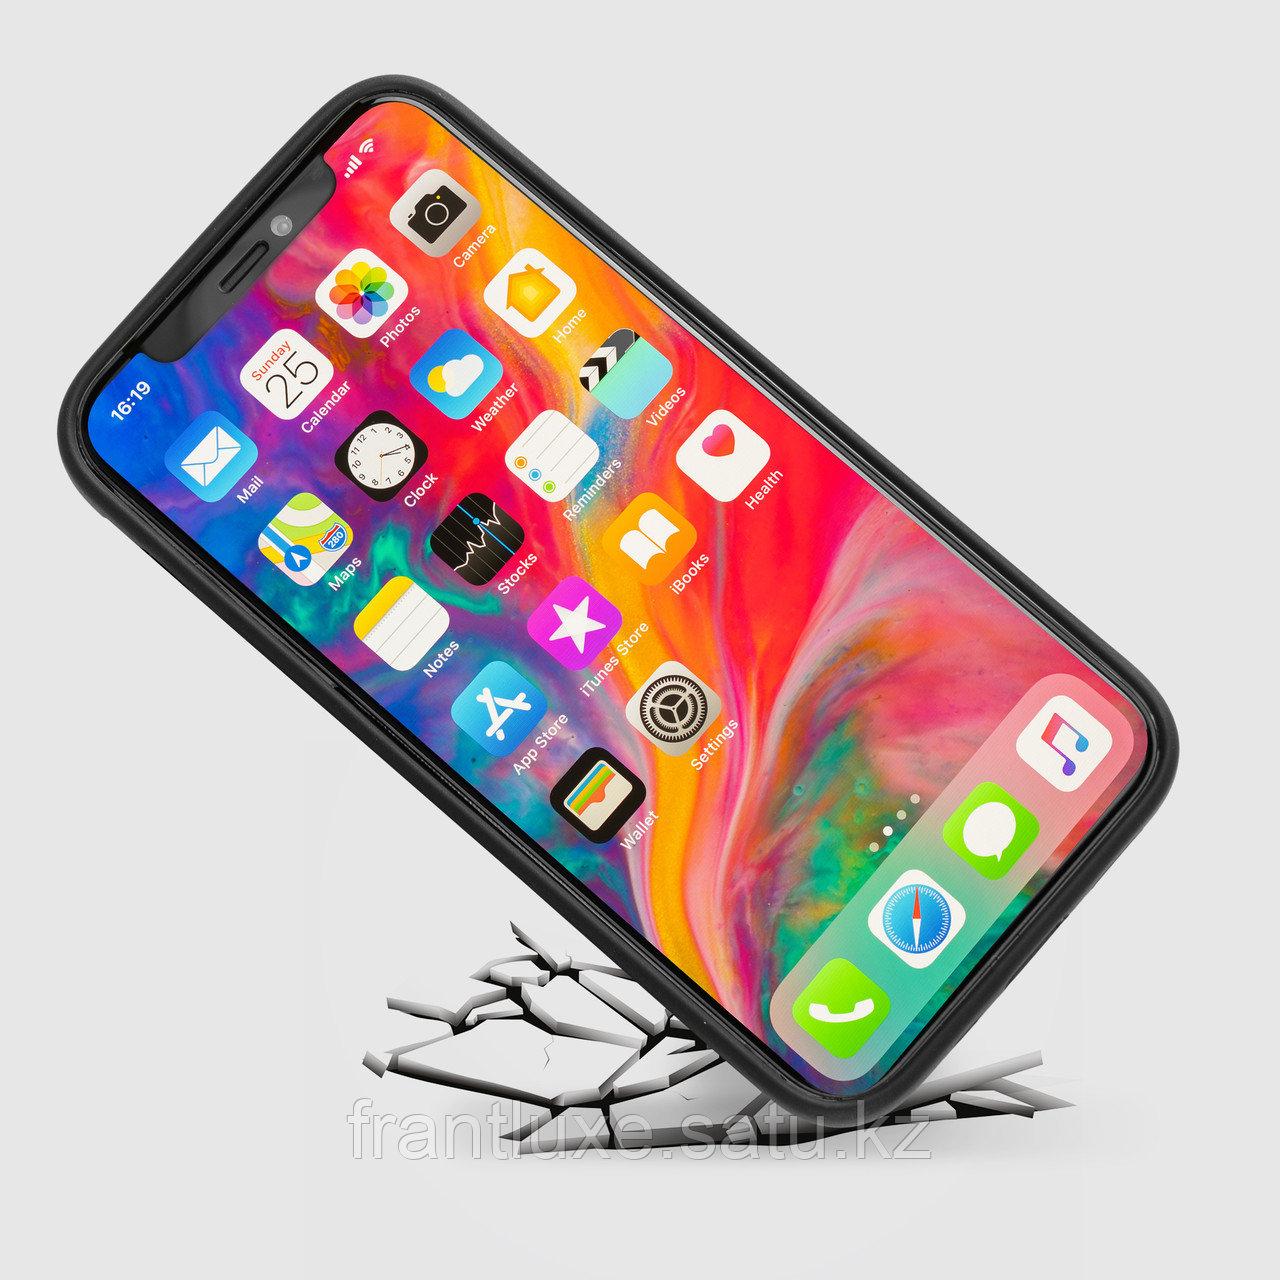 Чехол для телефона iPhone 12 Pro Max серый - фото 5